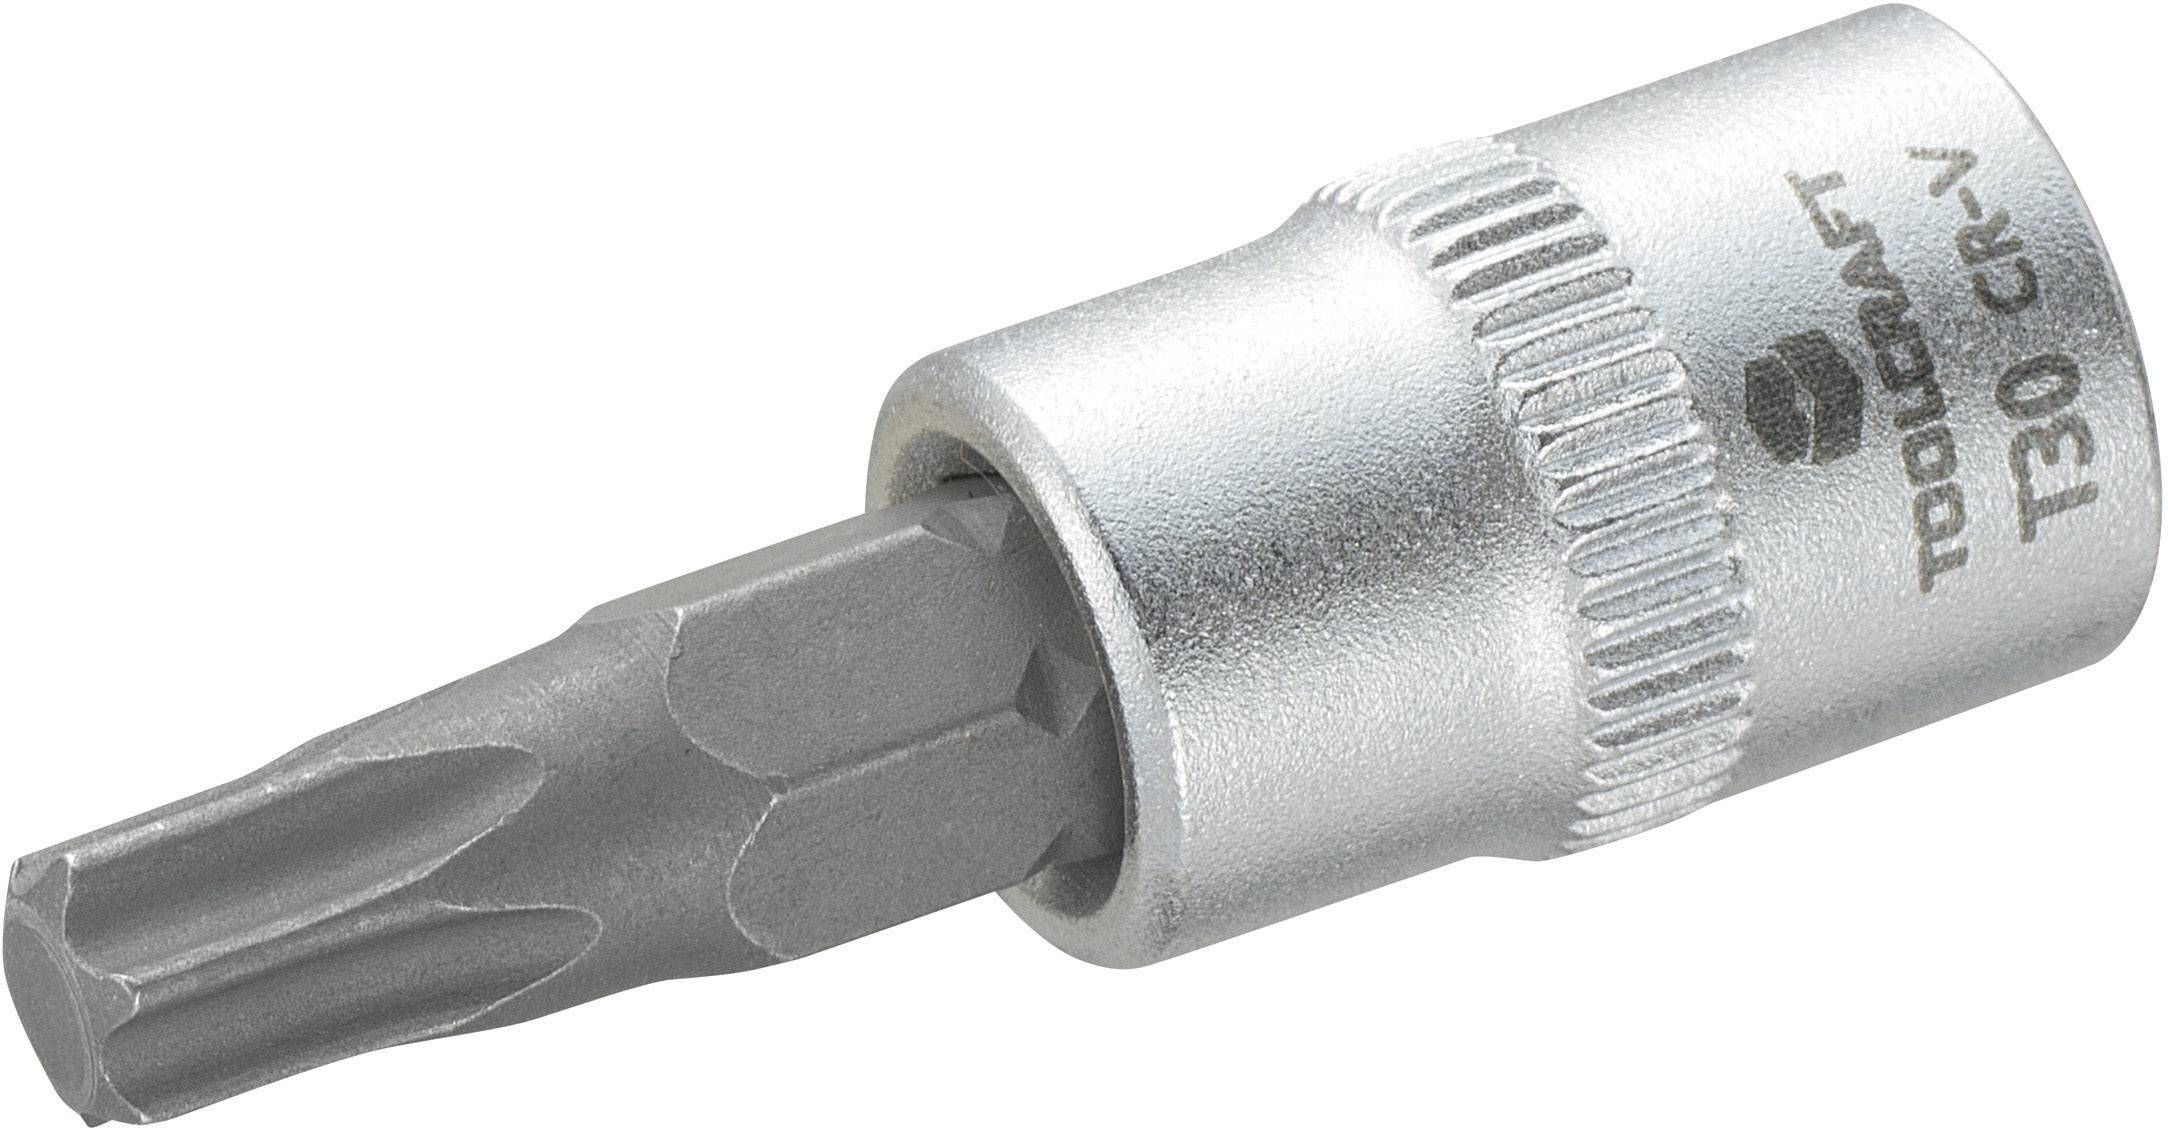 Toolcraft t30 816153 torx inserto giravite a bussola t 30 1//4 6.3 mm